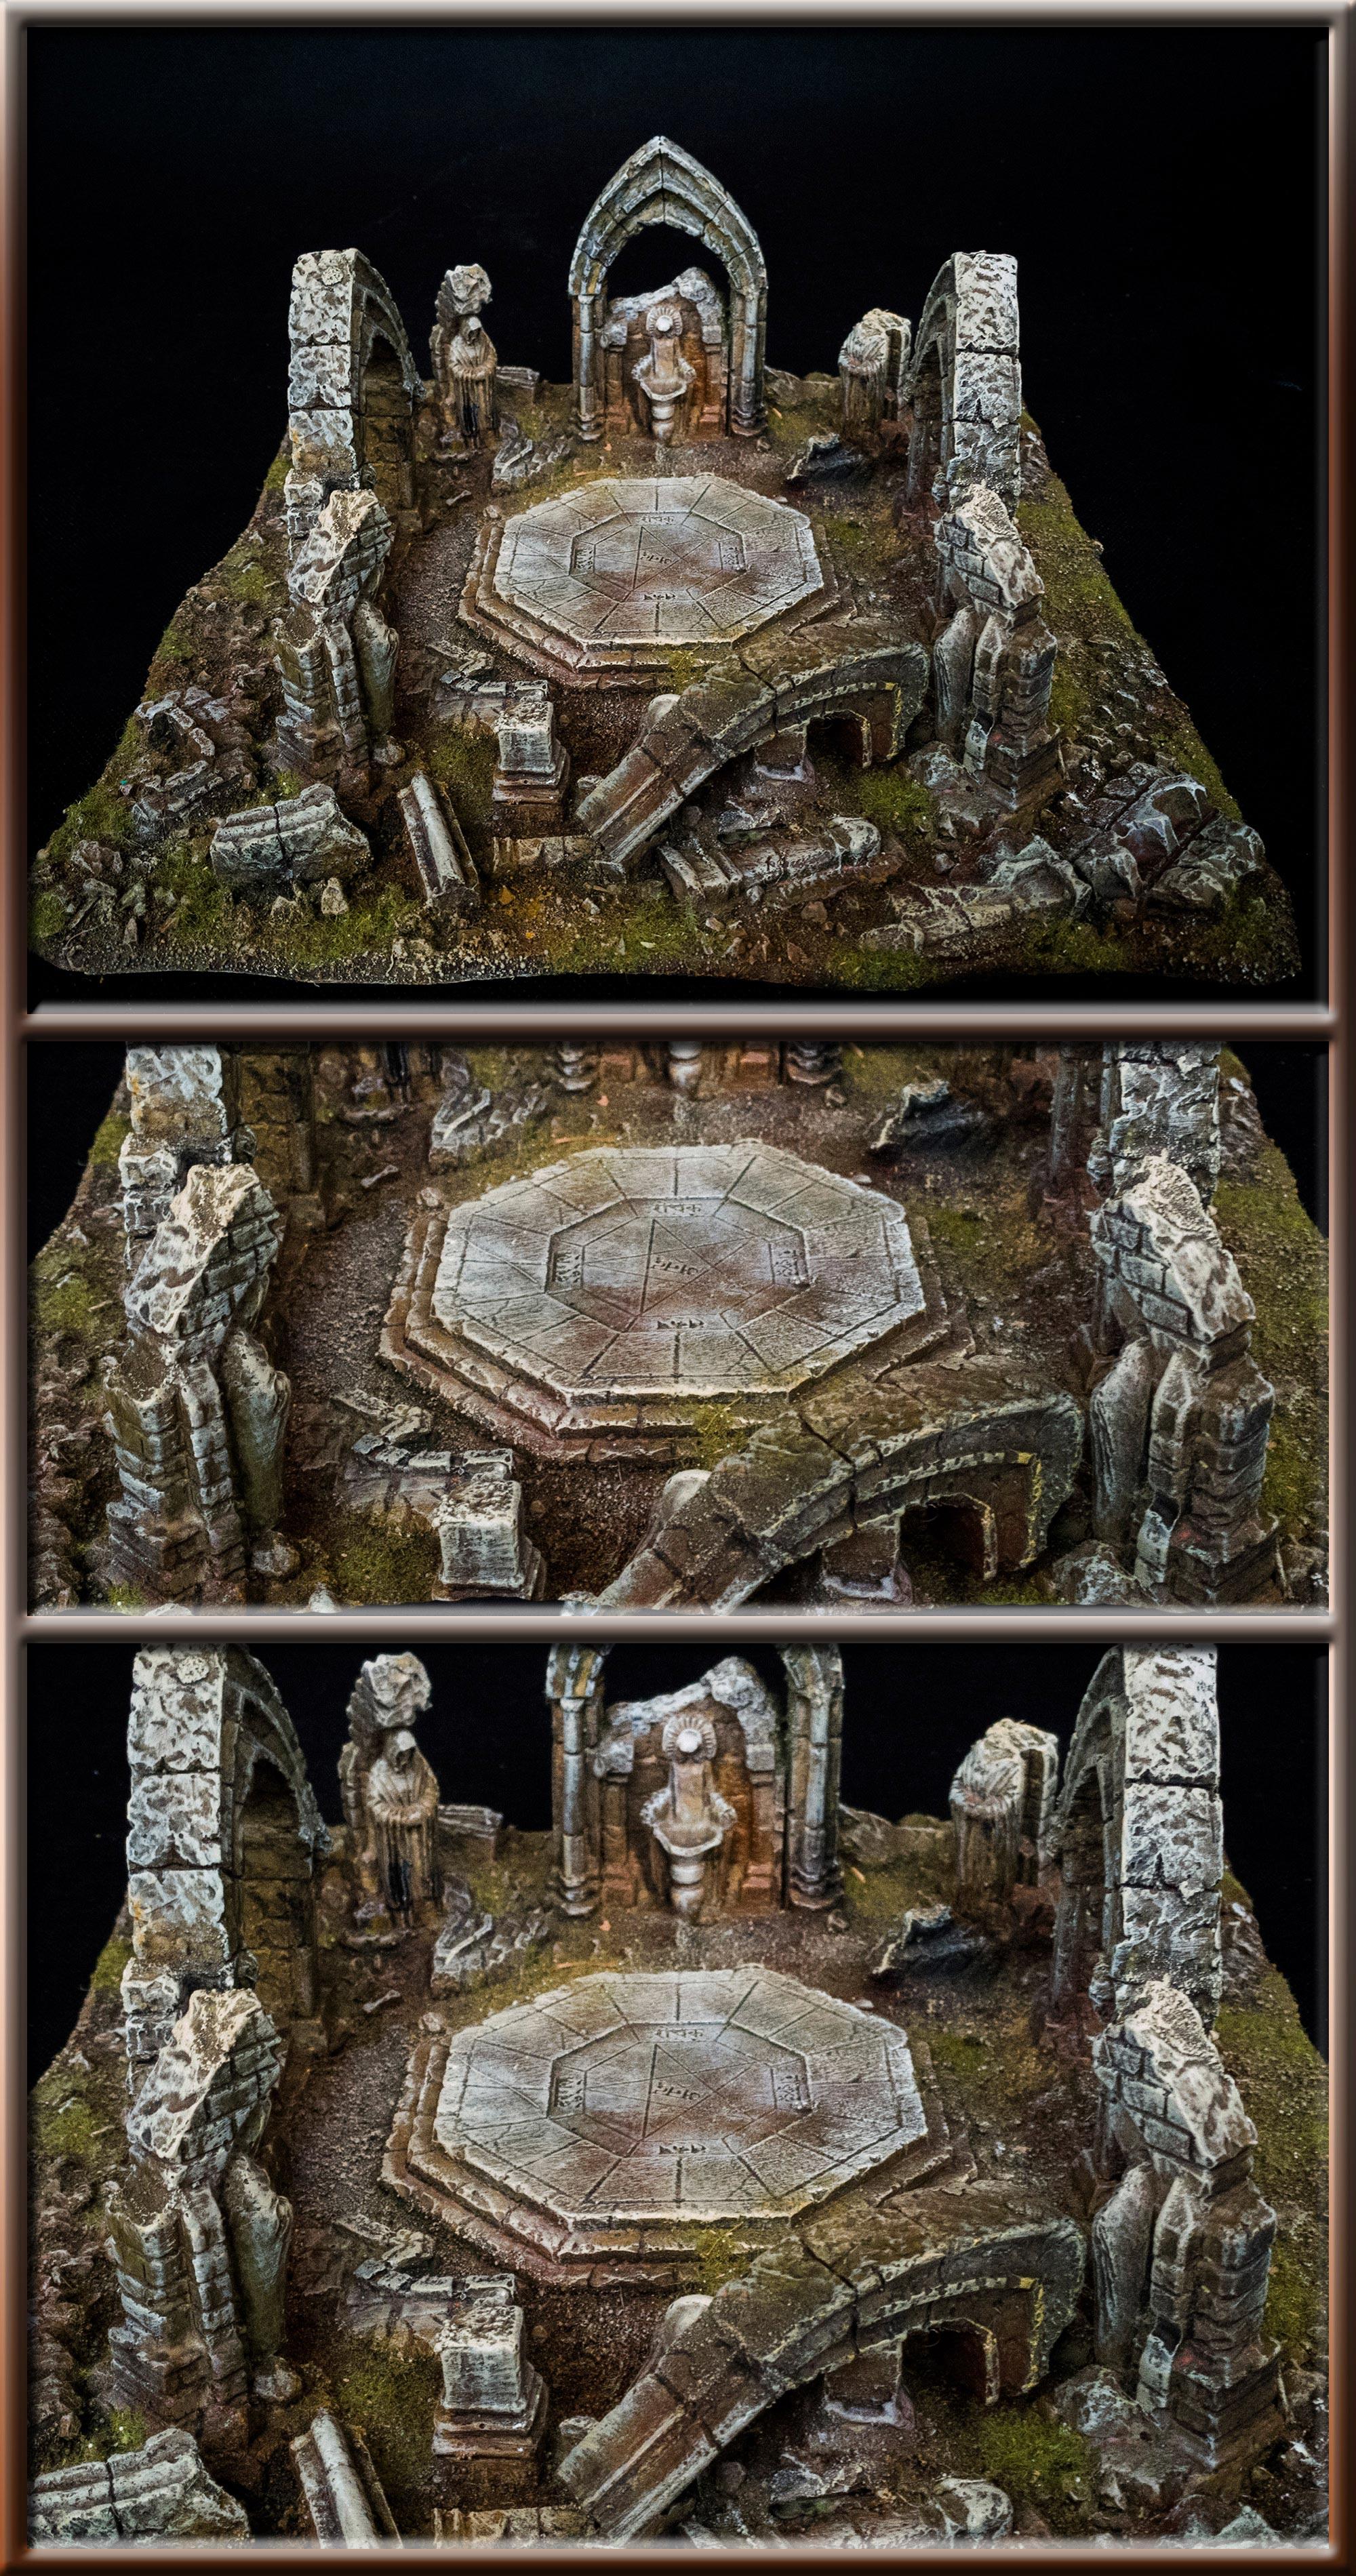 RUINS OF THE MAUSOLEUM